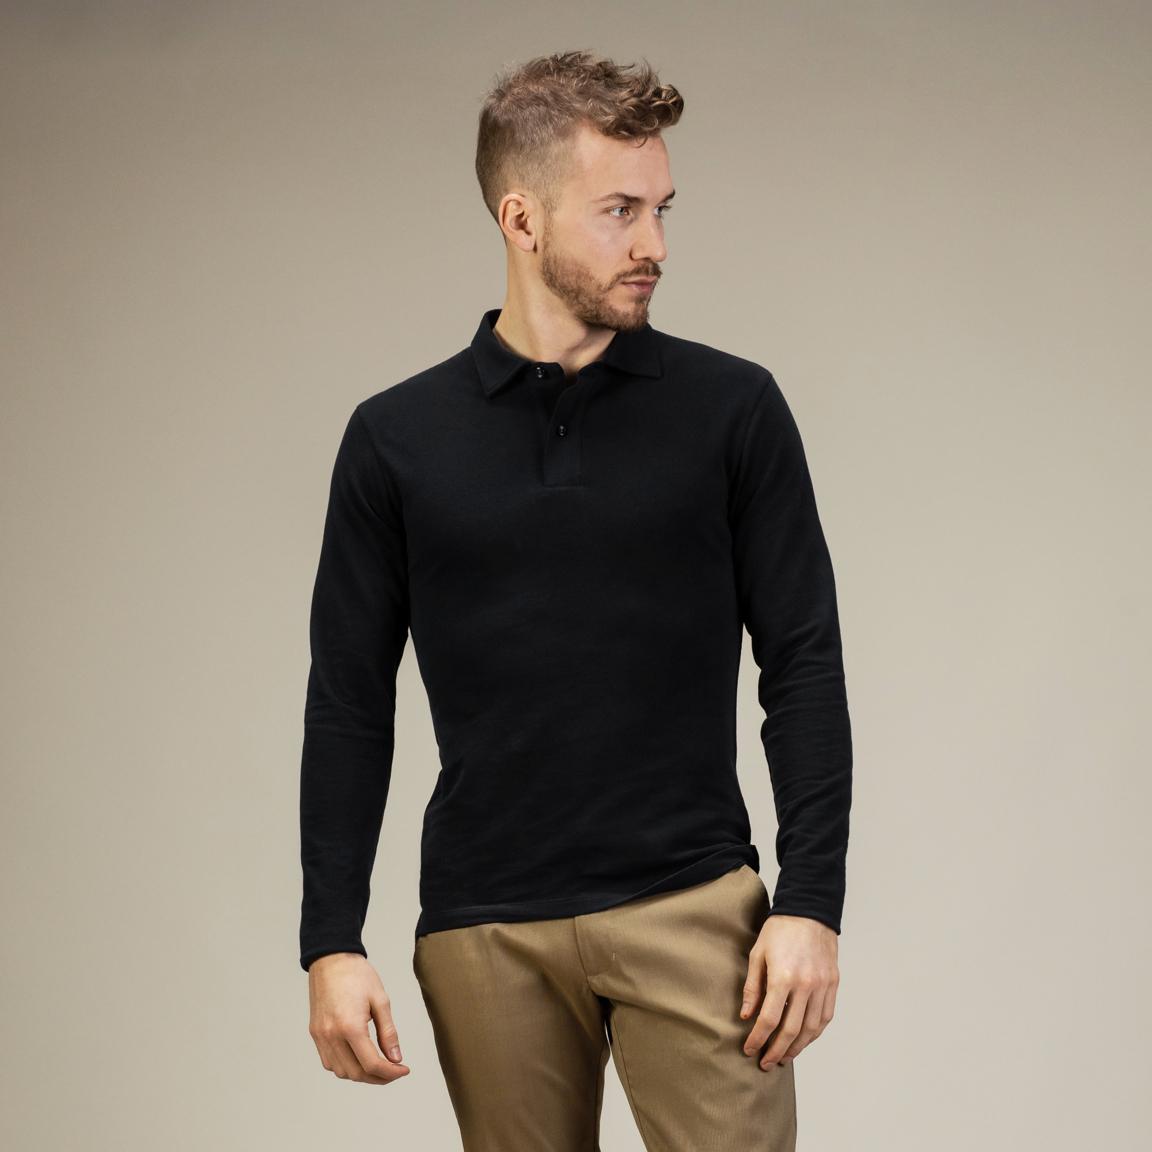 Black long-sleeved polo shirt